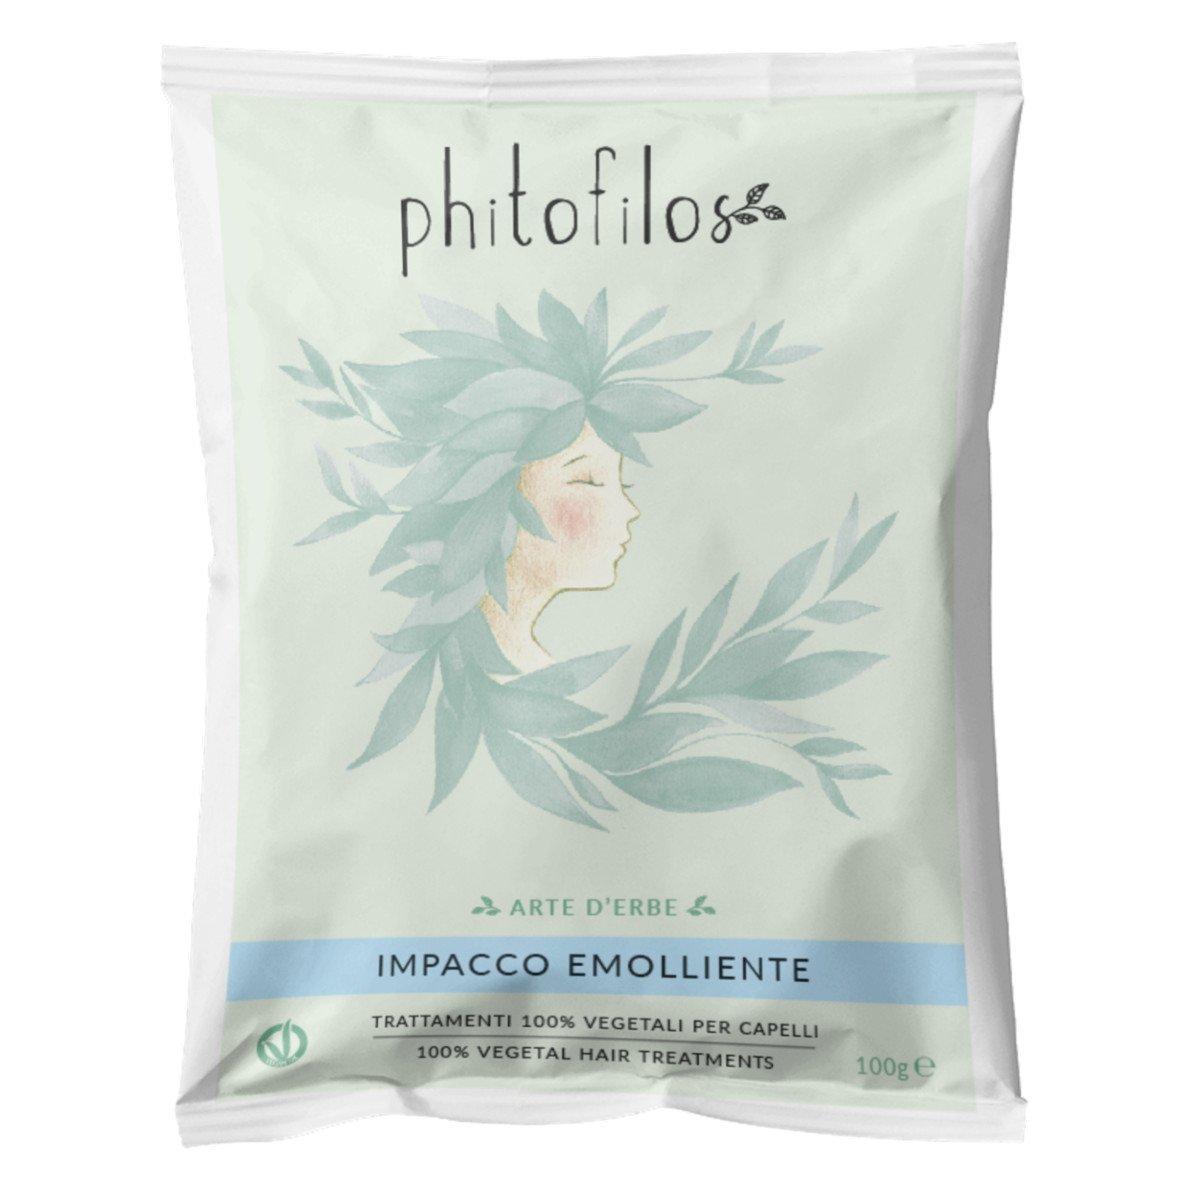 Impacco Emolliente Phitofilos Arte d'Erbe